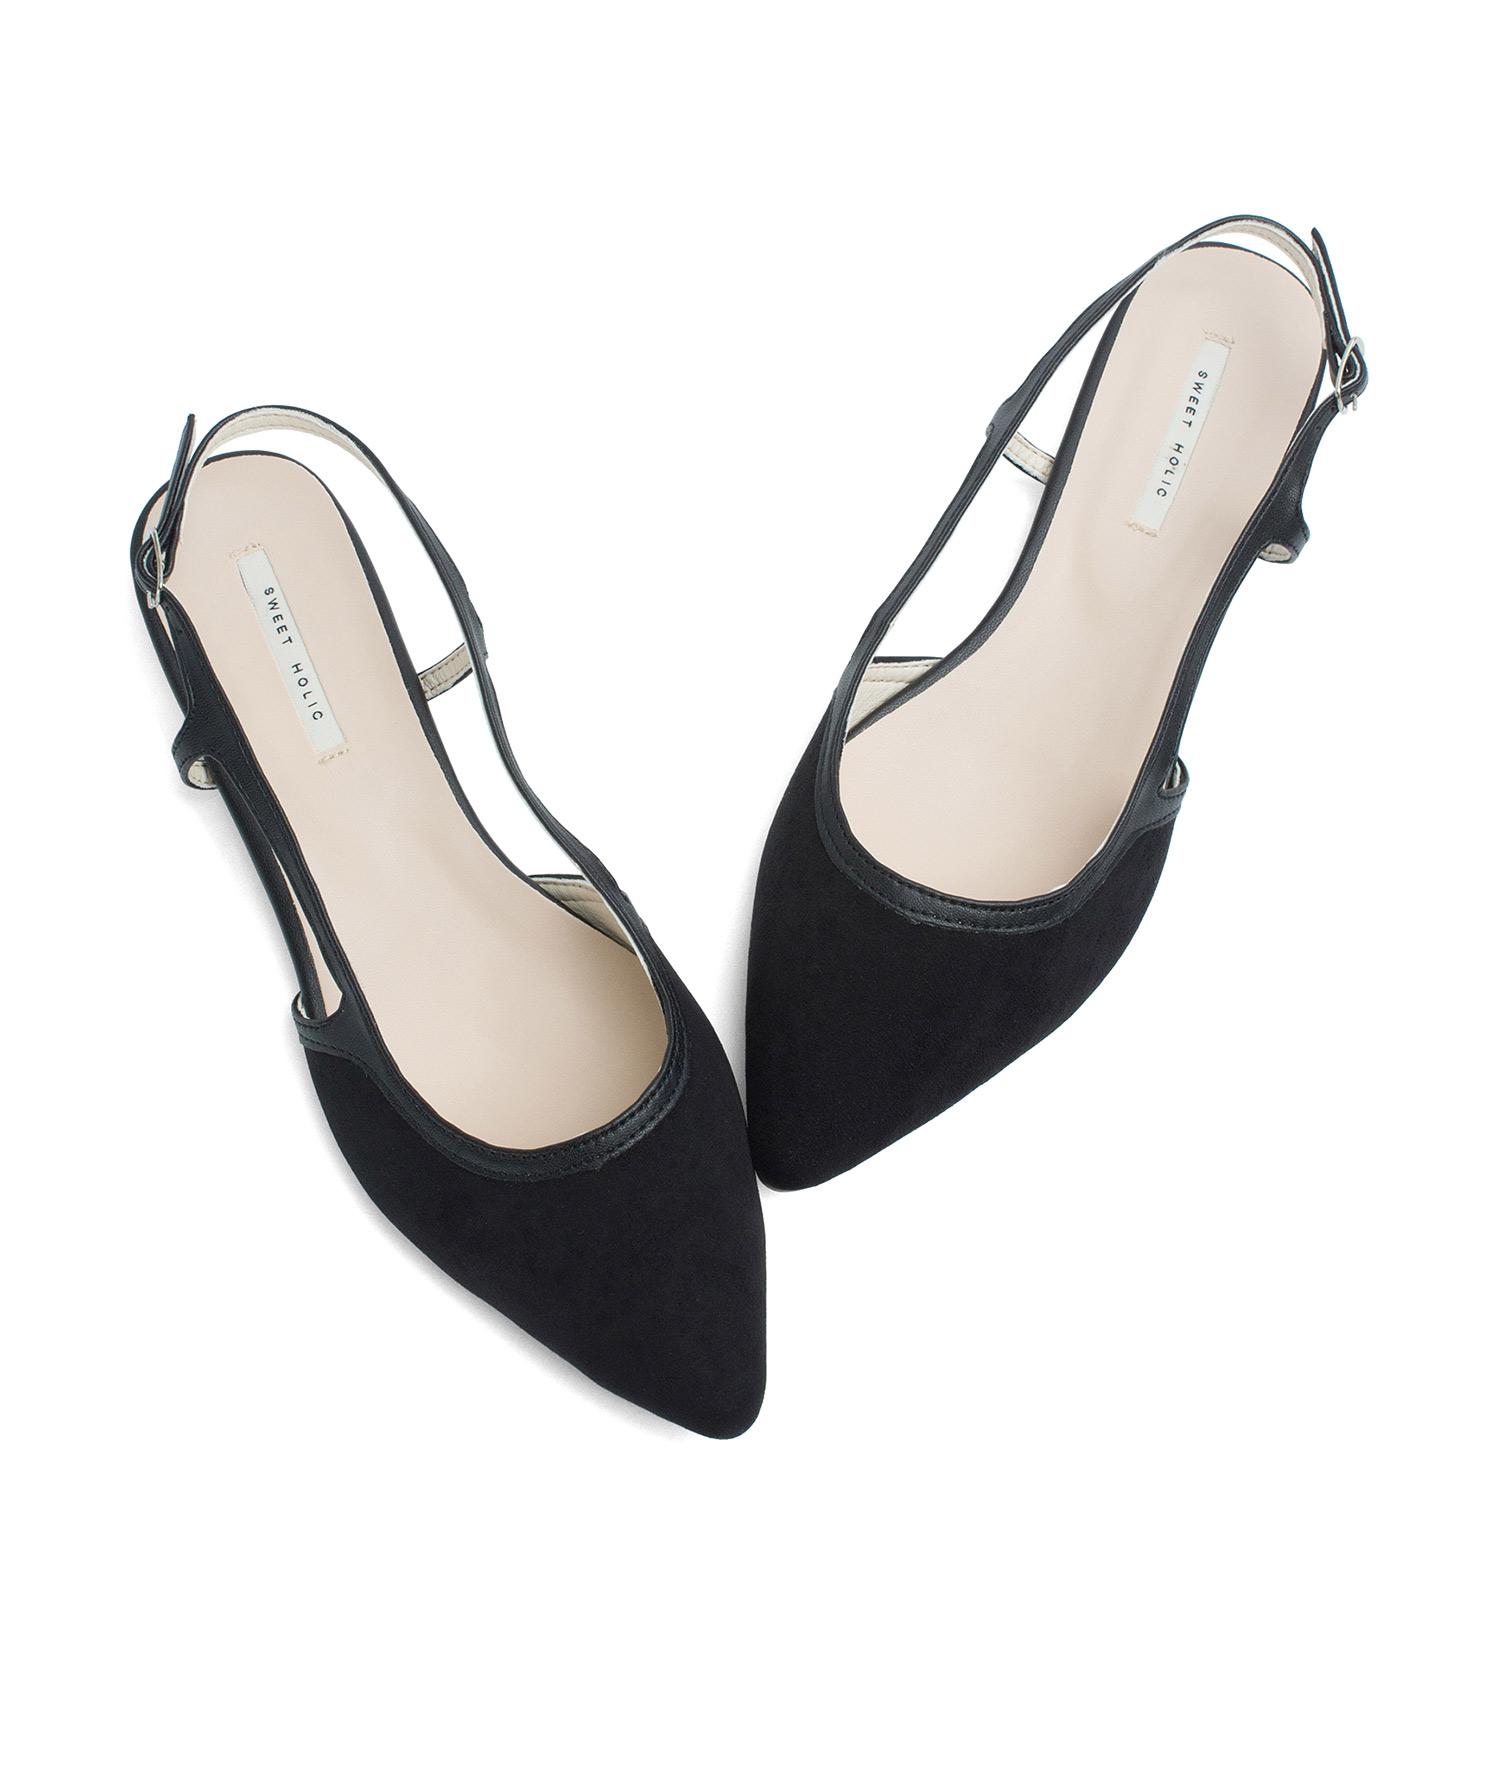 AnnaKastle Womens Faux Suede Pointed Toe Slingback Flats Black 75e46f45f4